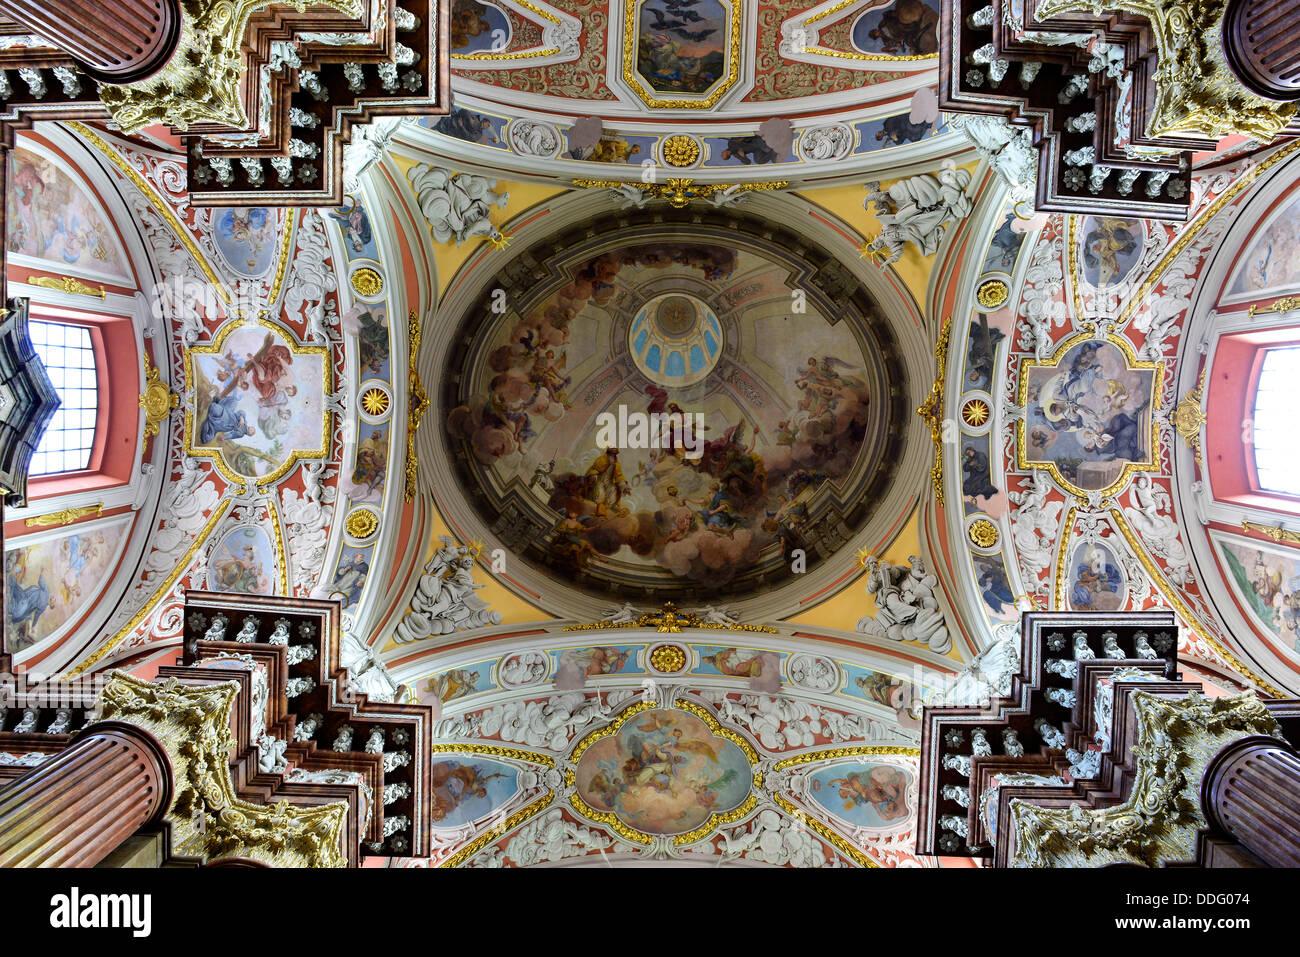 St Stanislaus Basilica Poznan, Wielkopolska province Poland. - Stock Image